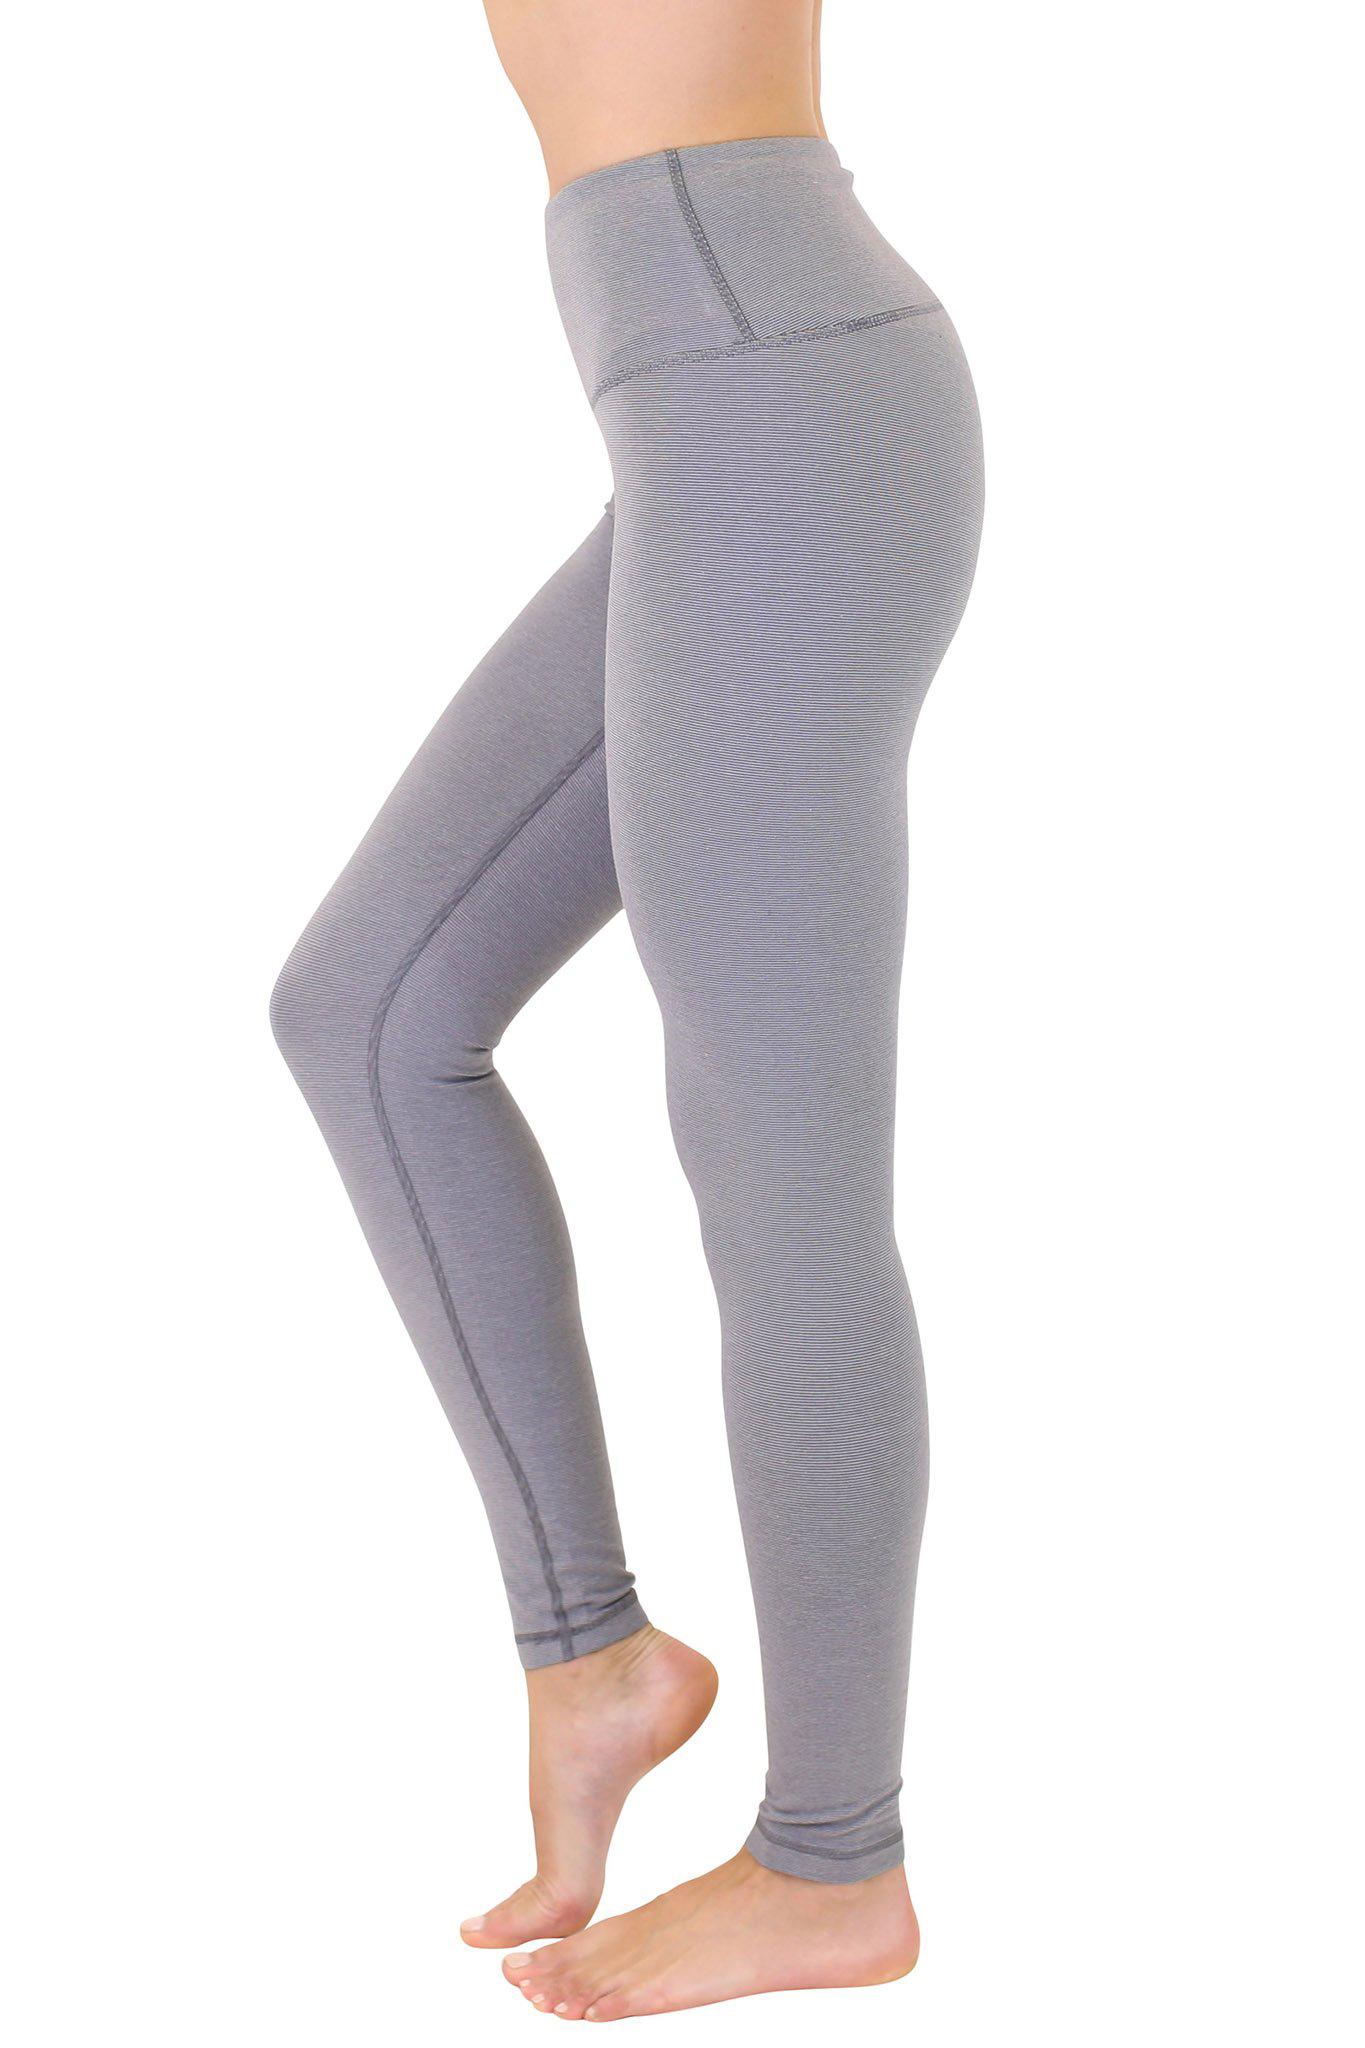 Women's Cotton High Waist Leggings, Heather Gray, swatch